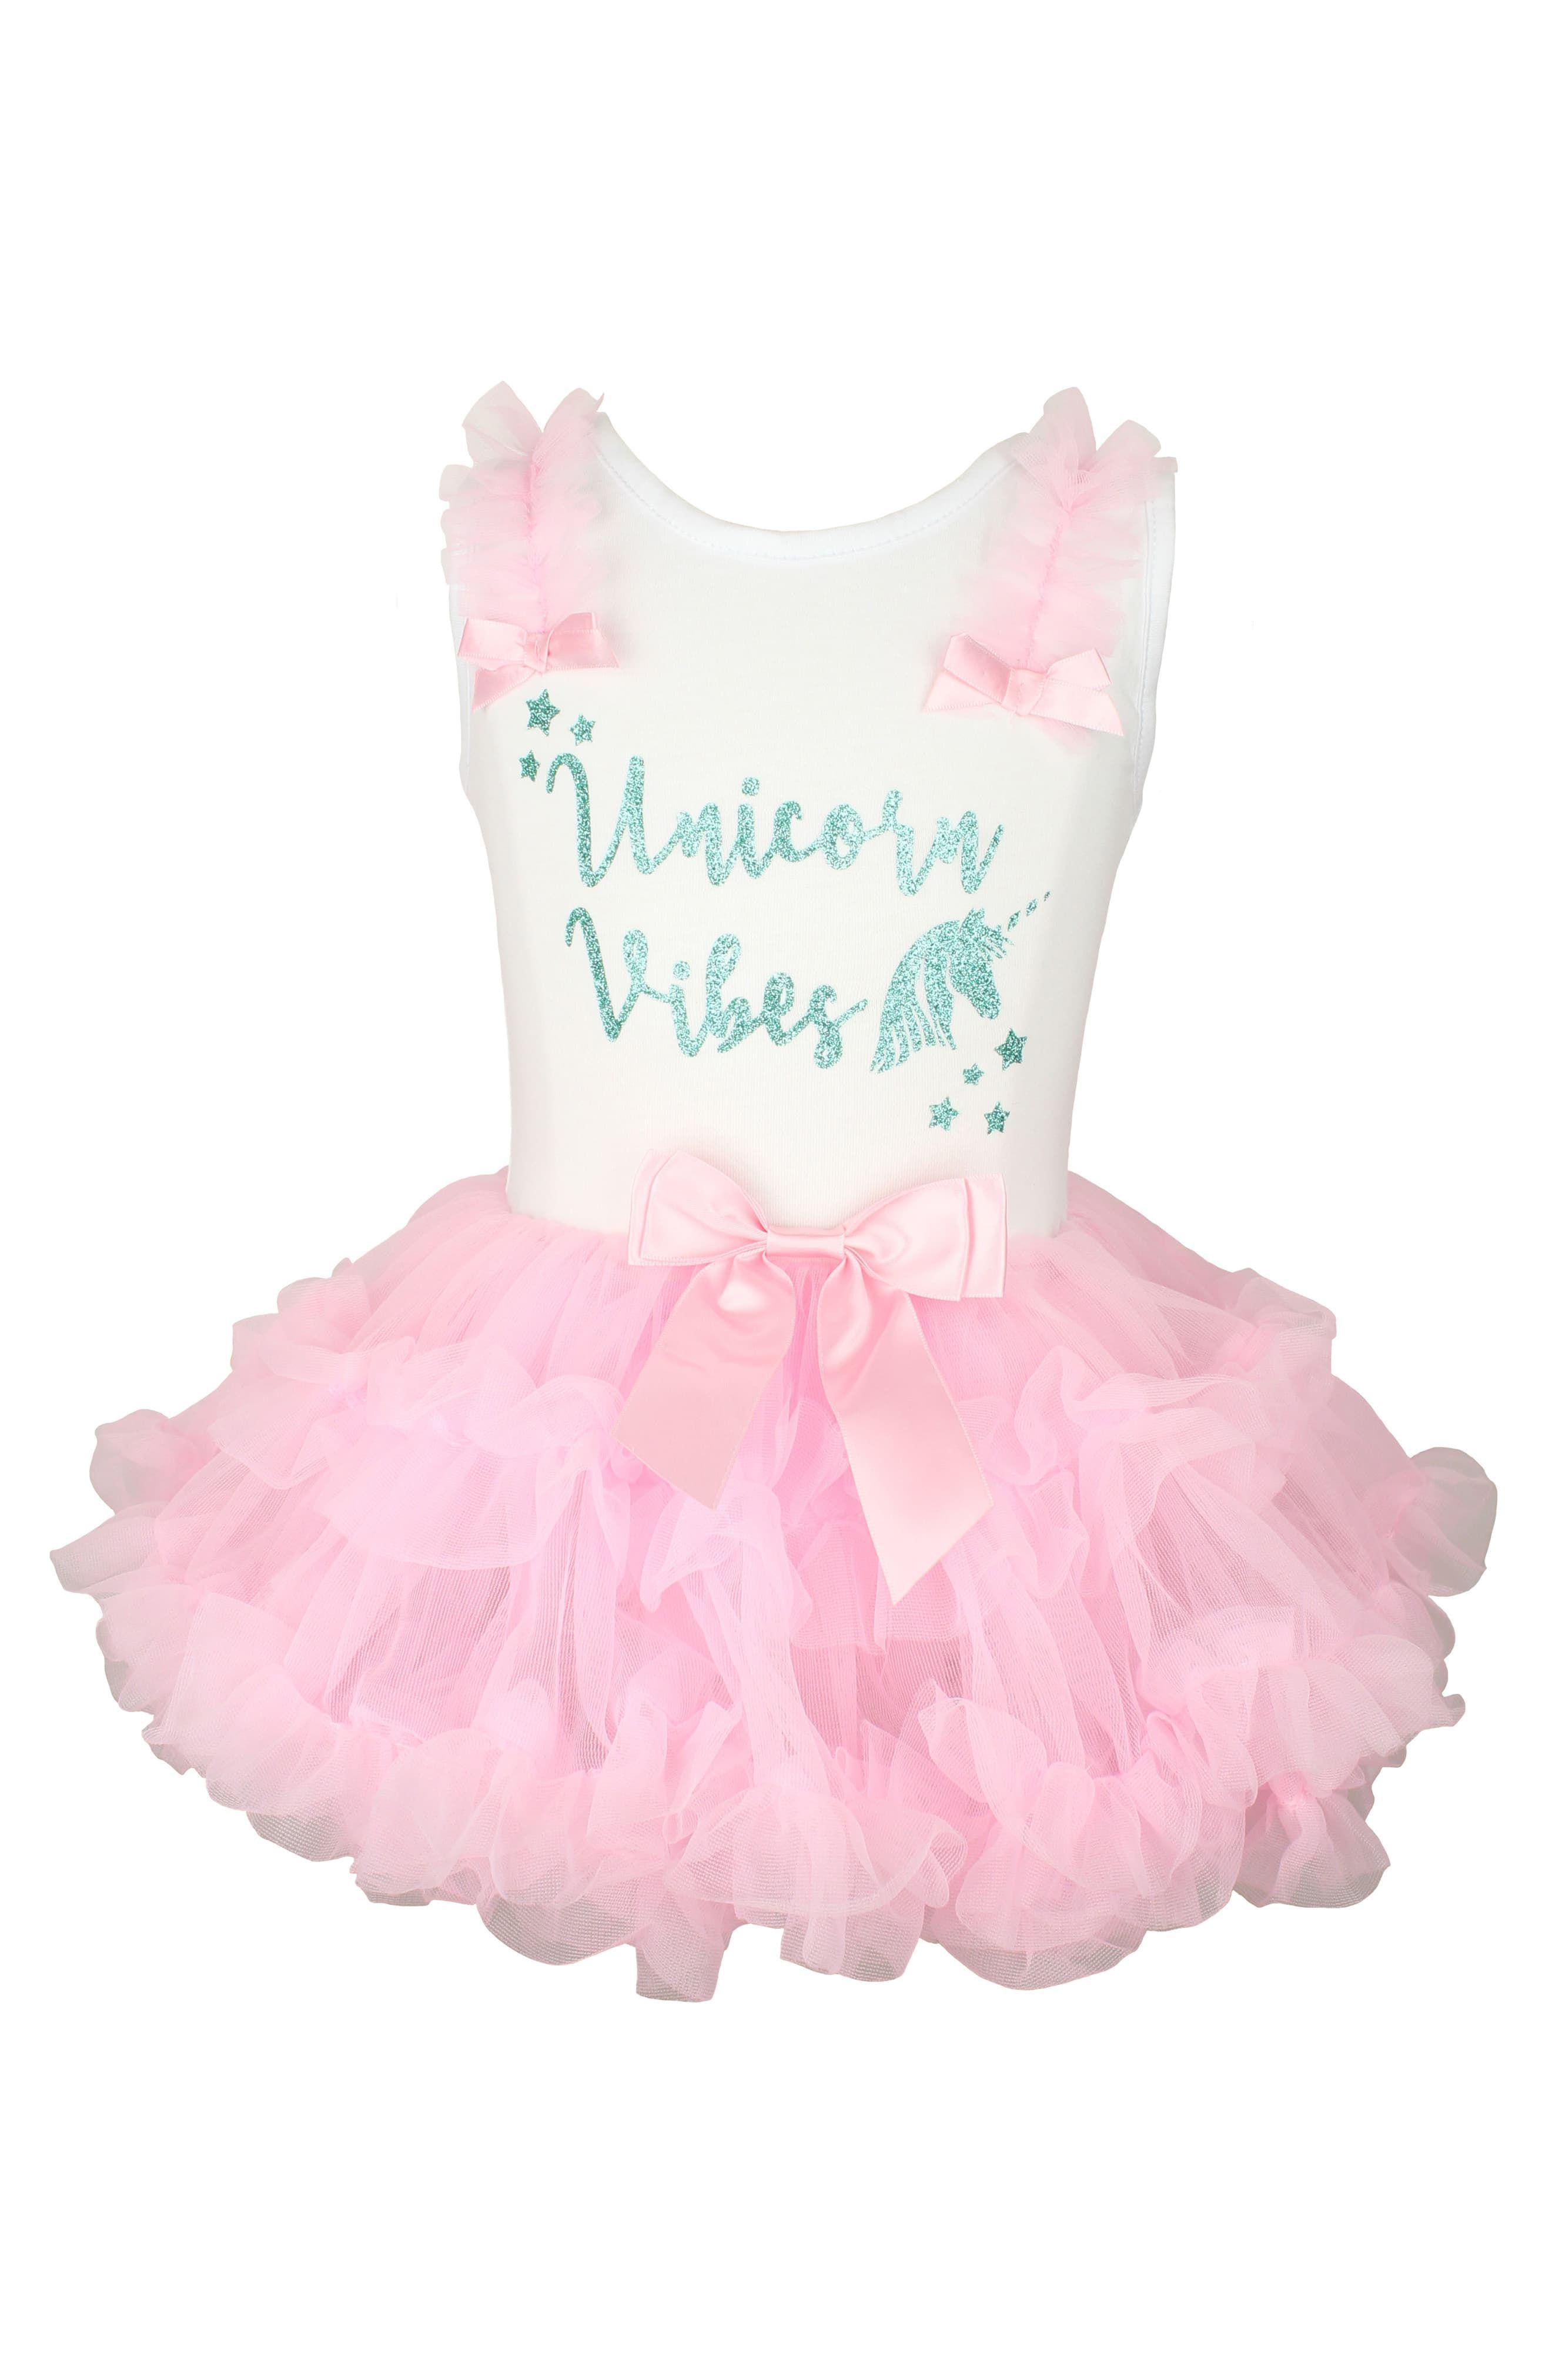 SALE NEW Pink Ballet Dance Dress//Gymnastic Tutu Skirt Girls Leotard UK 234567